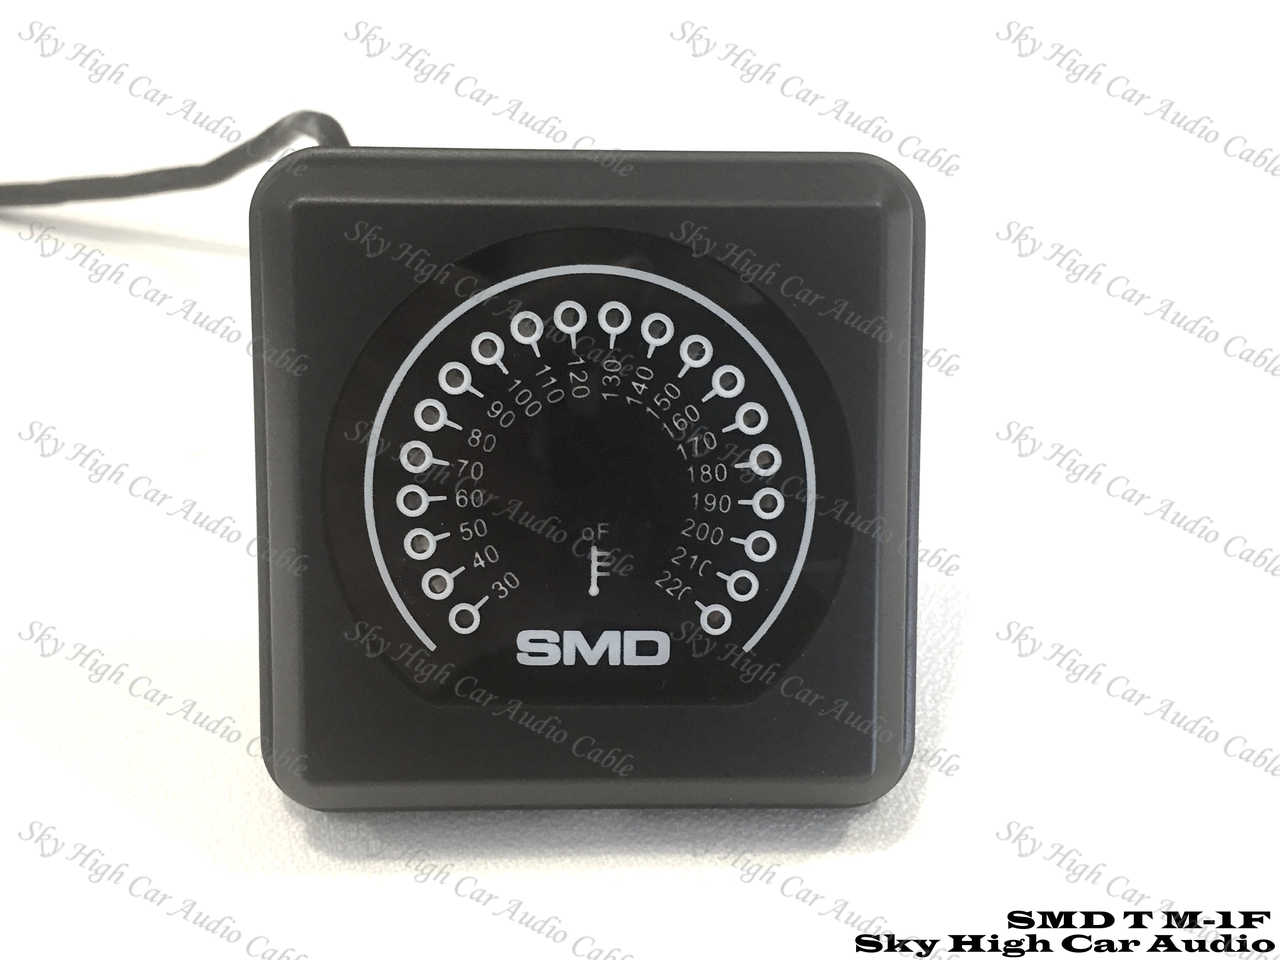 SMD TM-1 LED Amplifier Temperature Meter Fan Controller